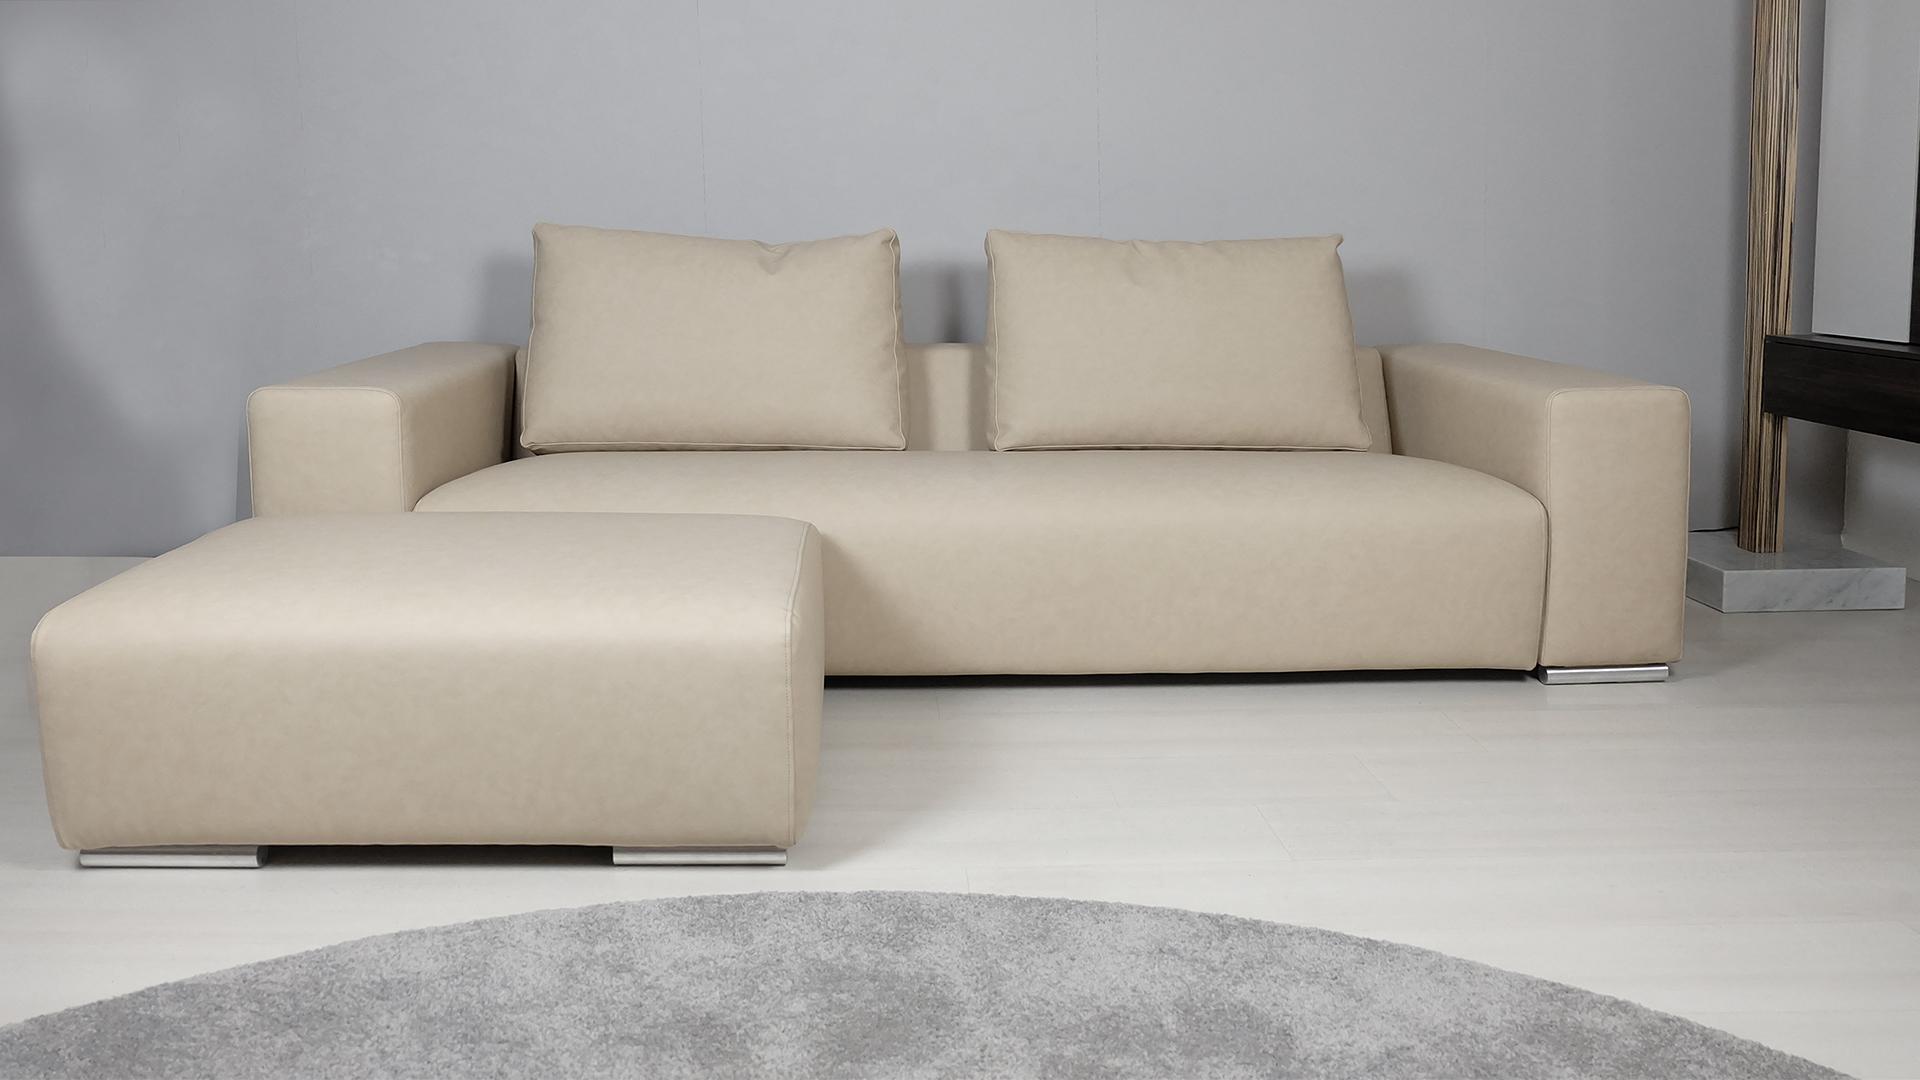 outlet-divano-lineare-con-pouf